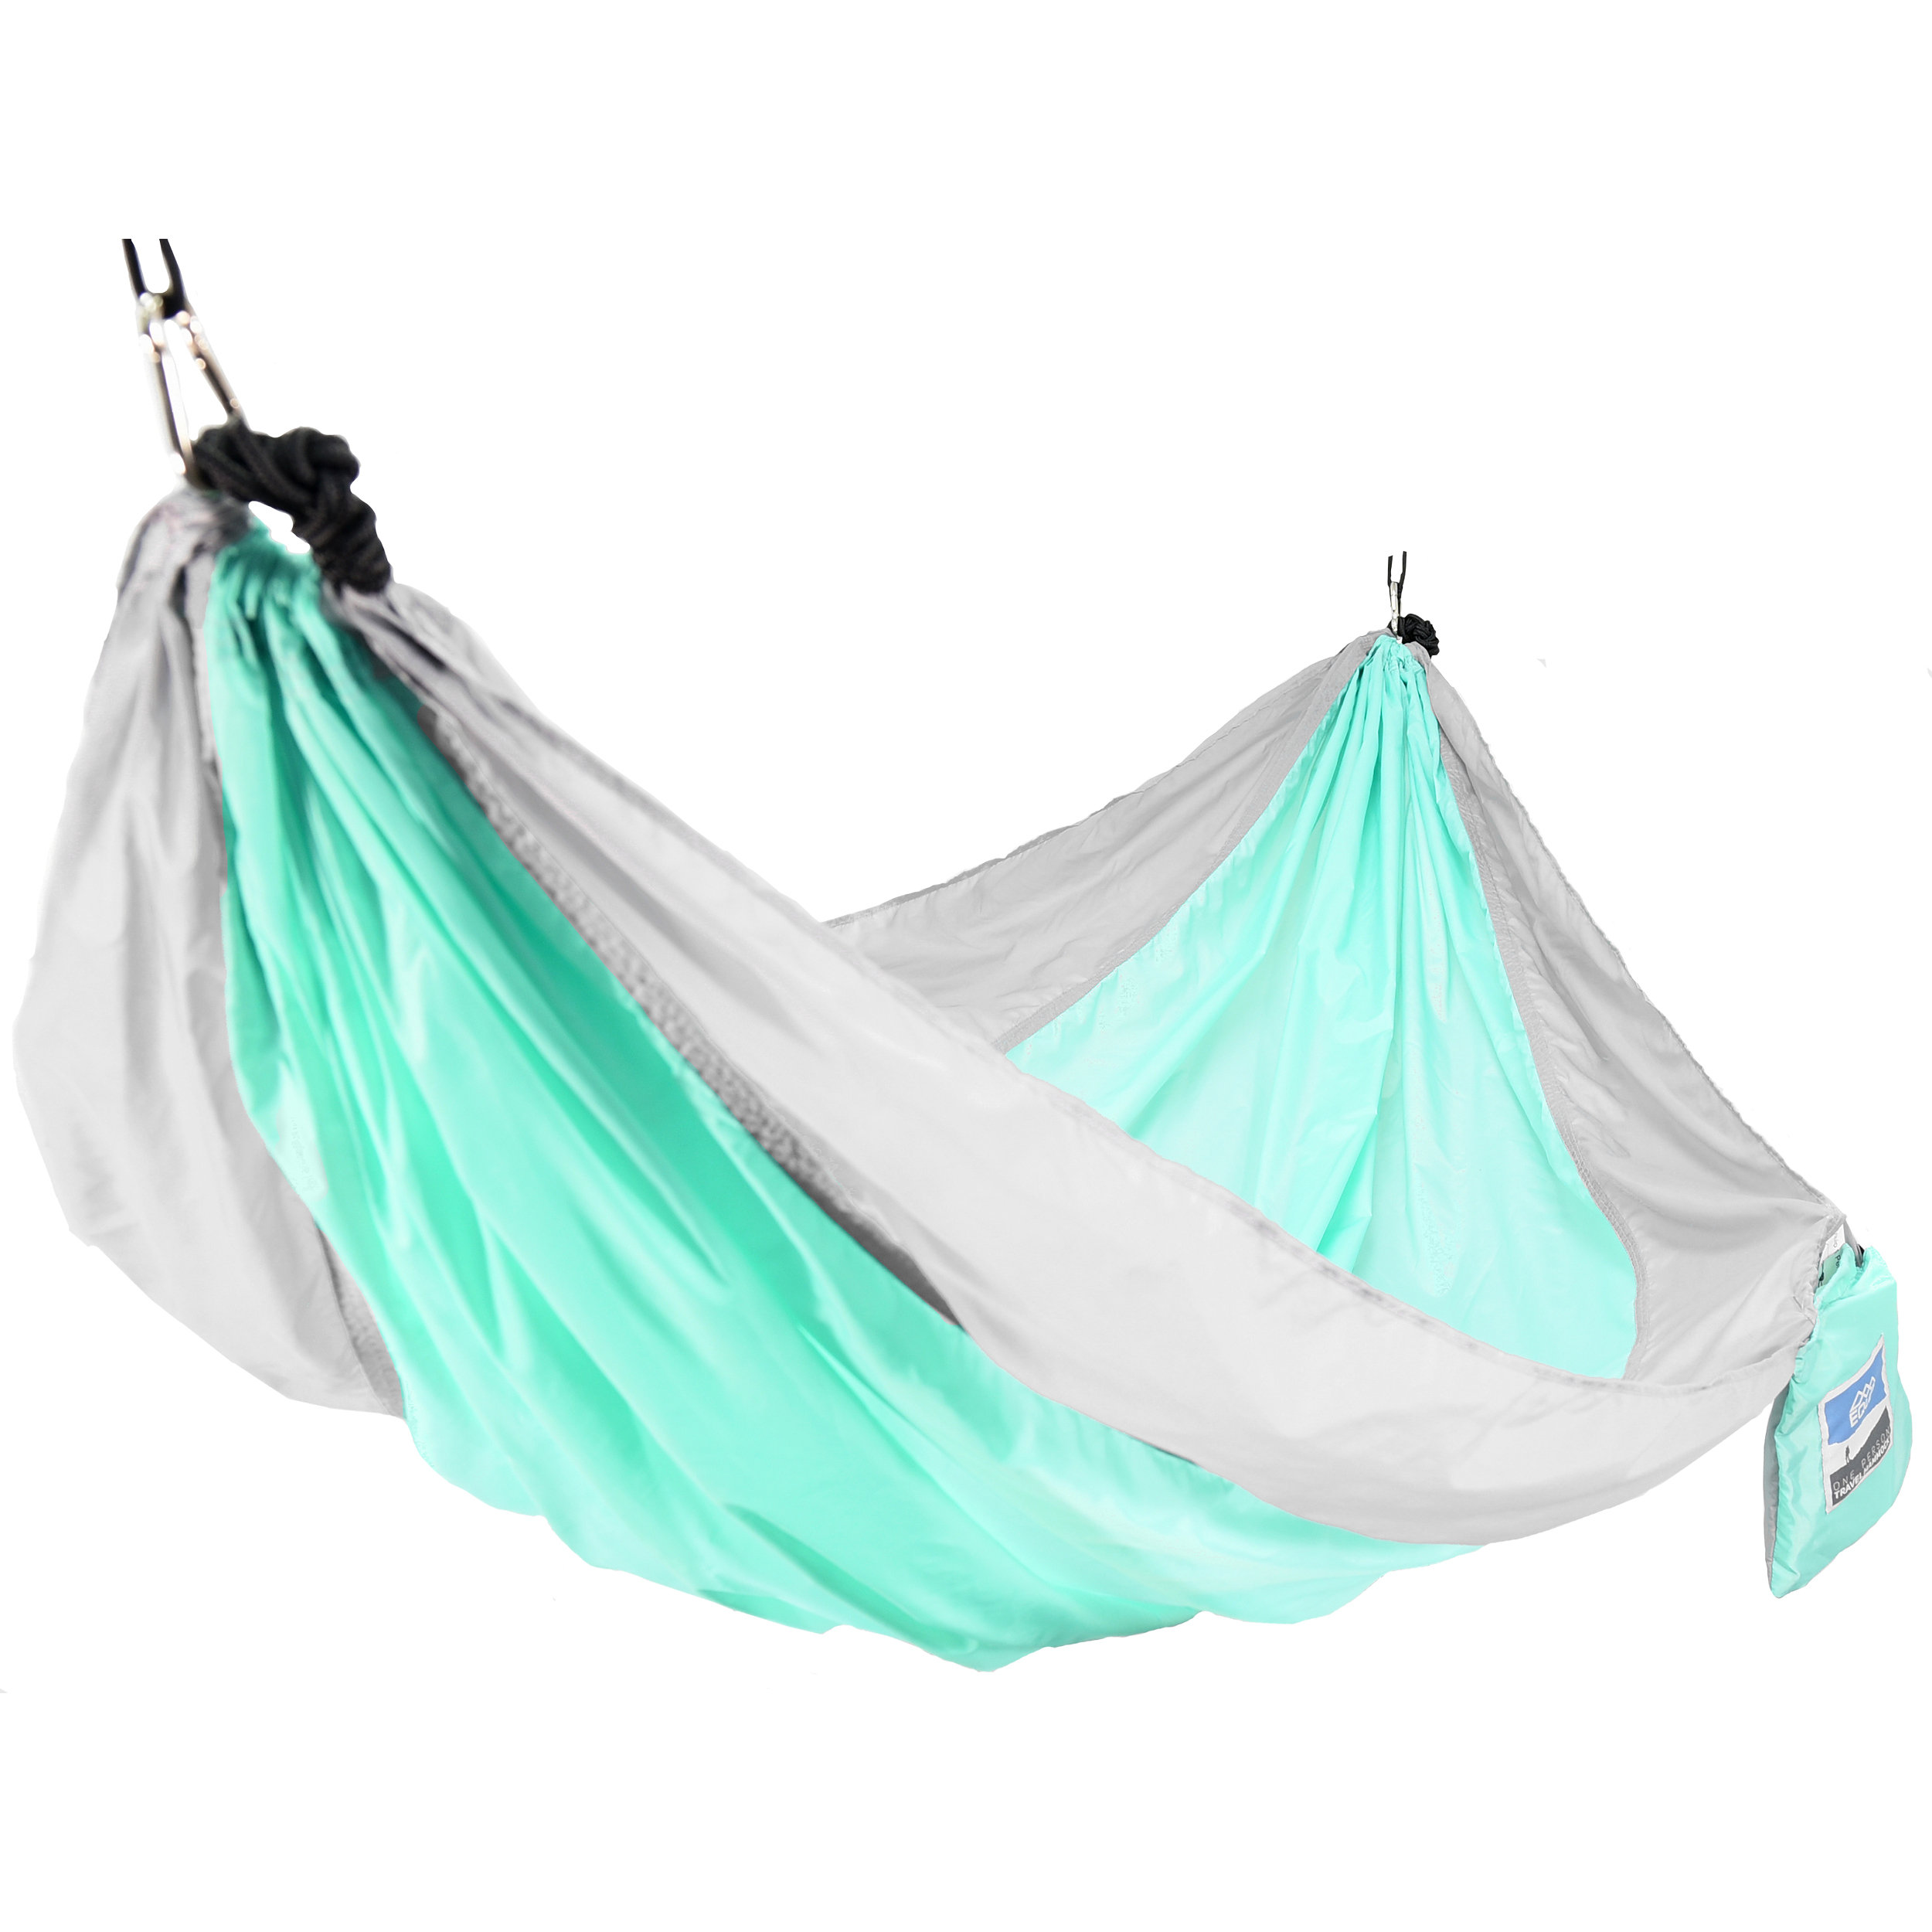 hammocks camping legacy and img double southwestern litho hammock portable personalized travel